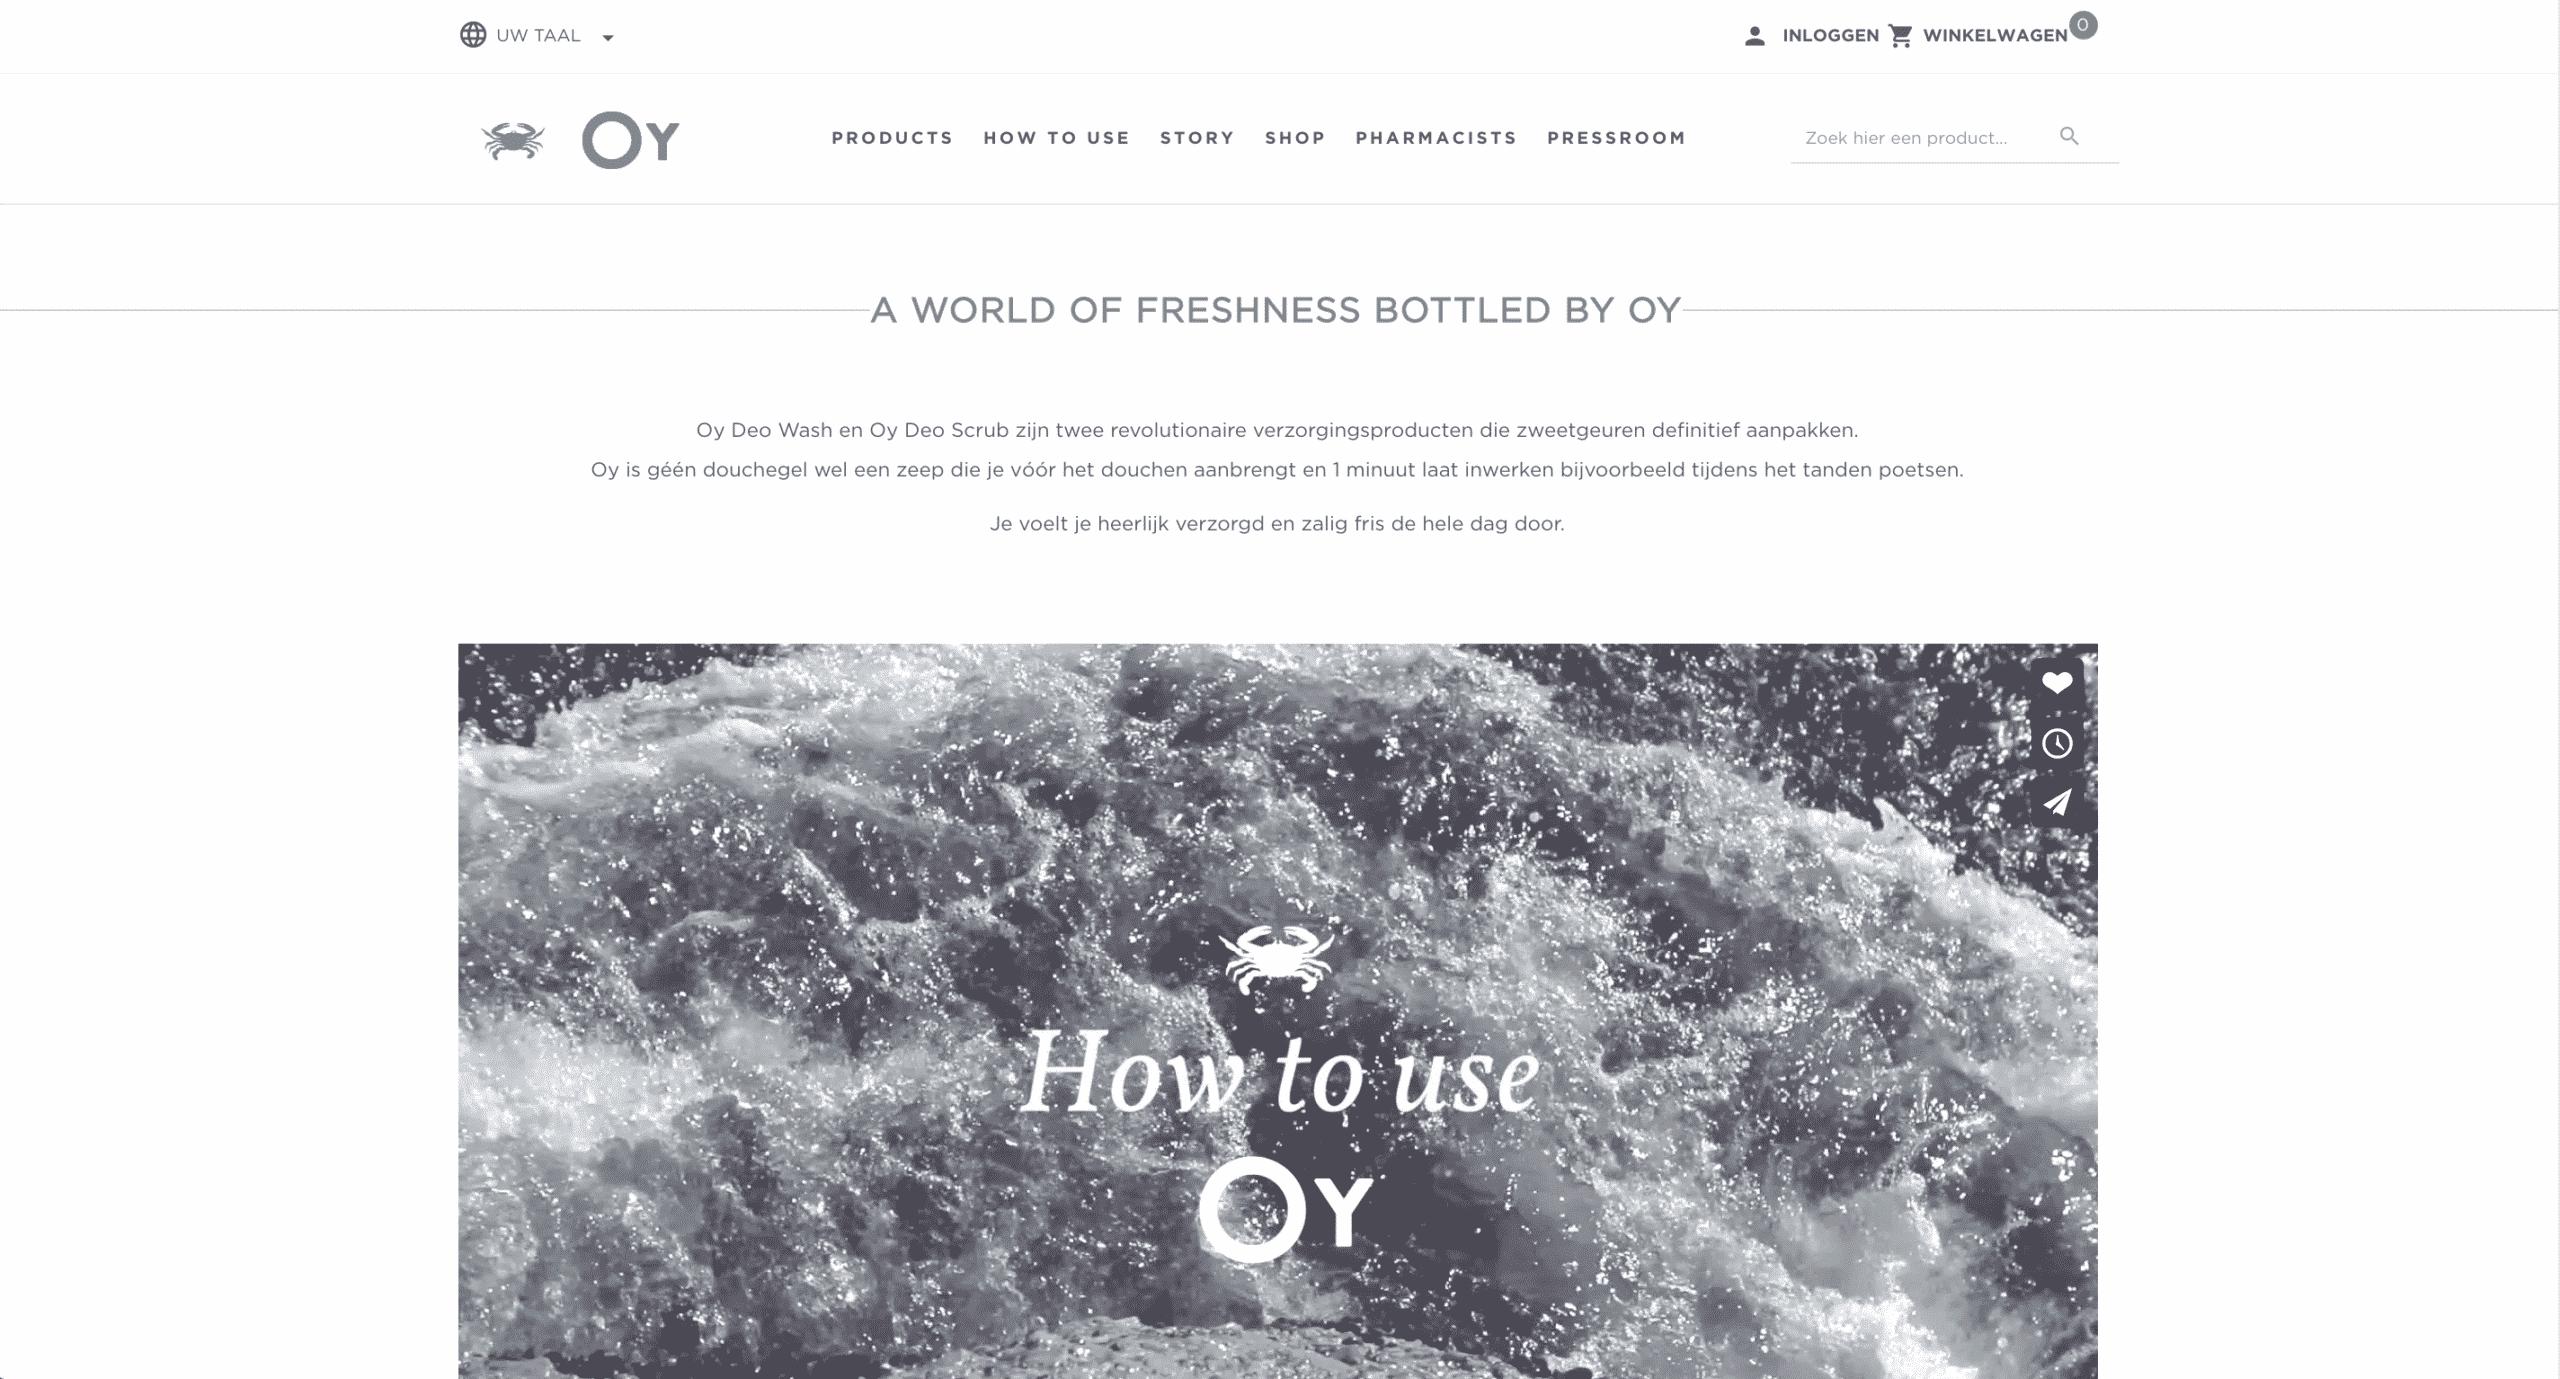 oycare webshop